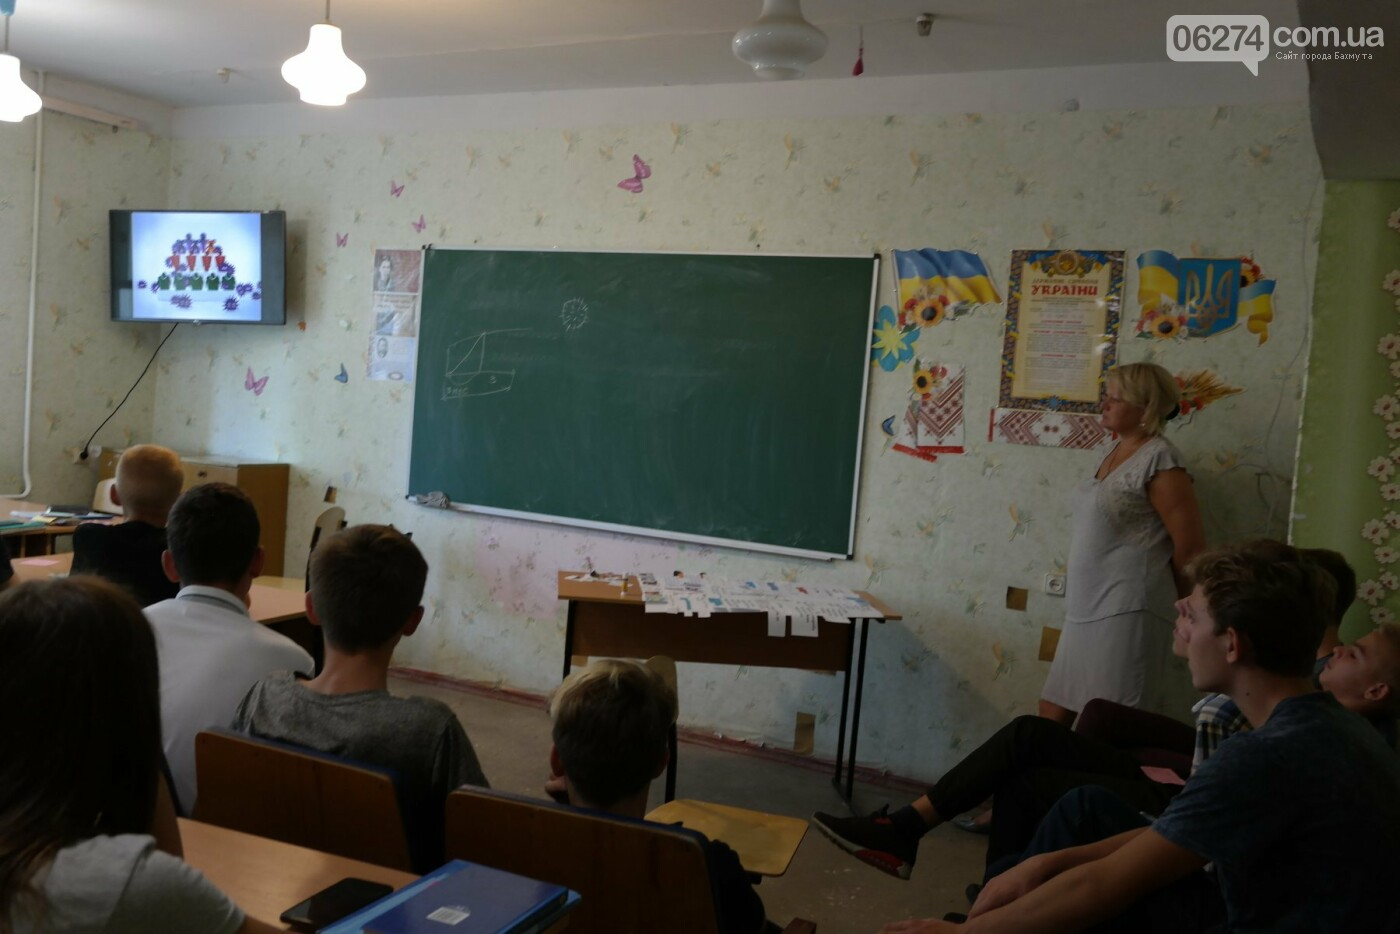 Школьникам Бахмута рассказали о проблеме ВИЧ/СПИД , фото-1